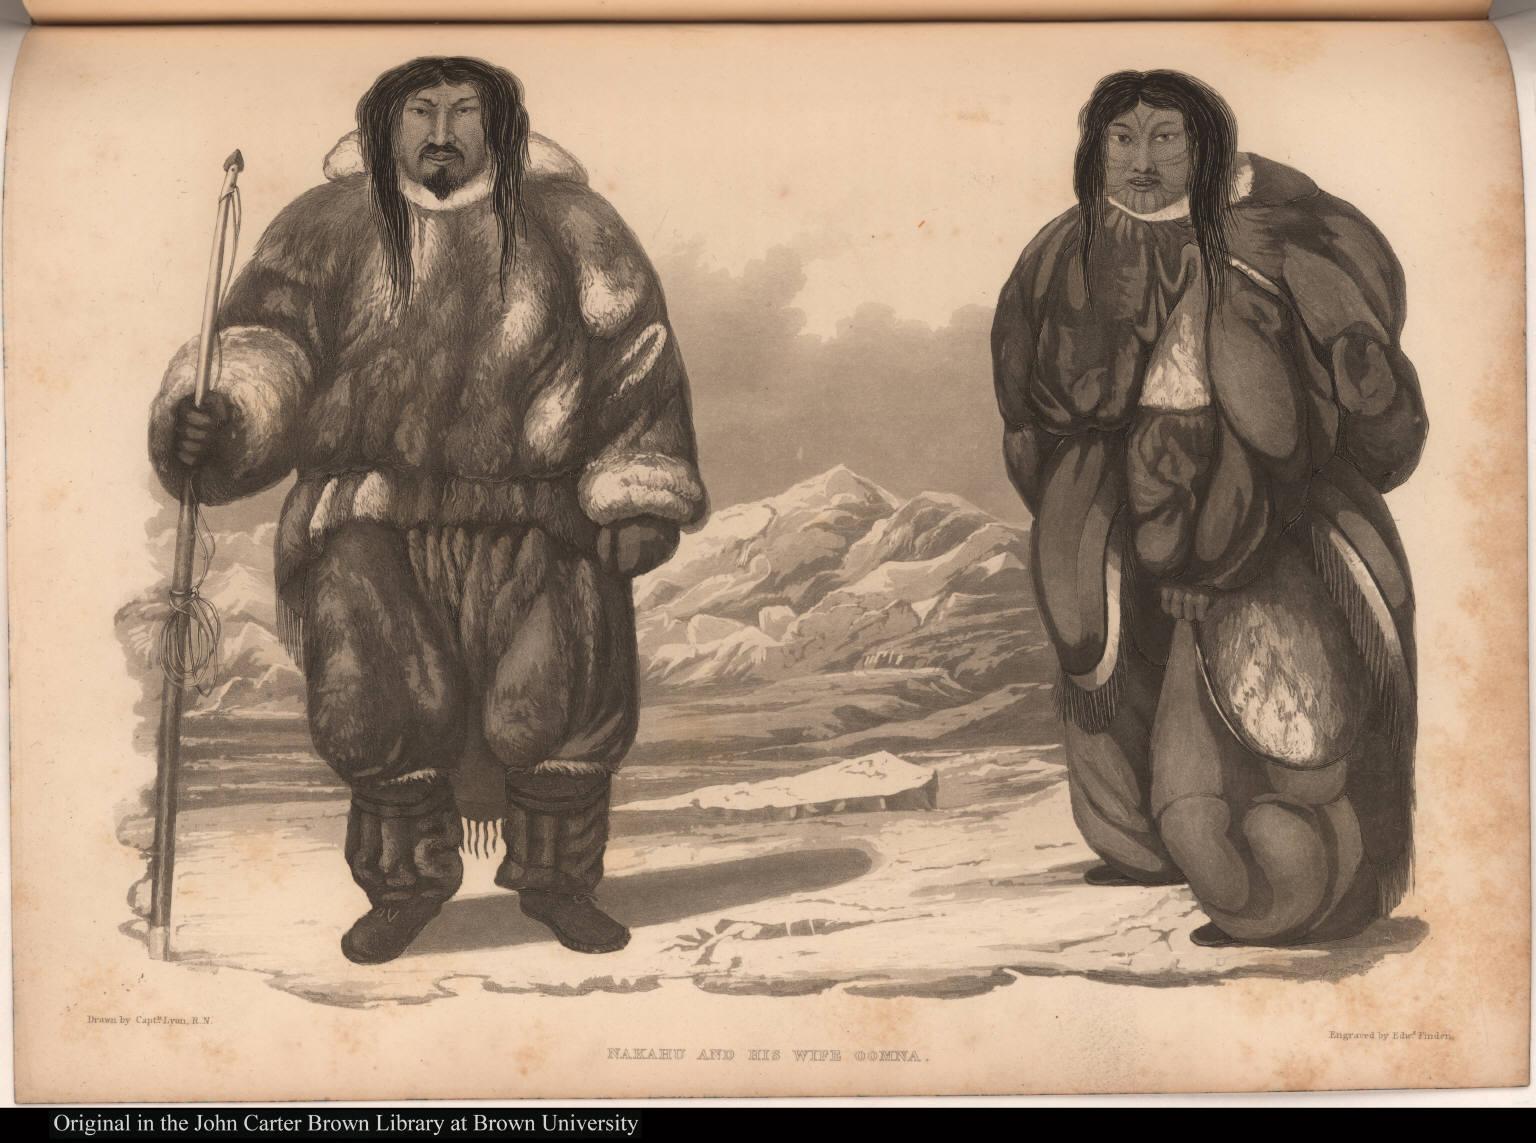 Nakahu and his Wife Oomna.